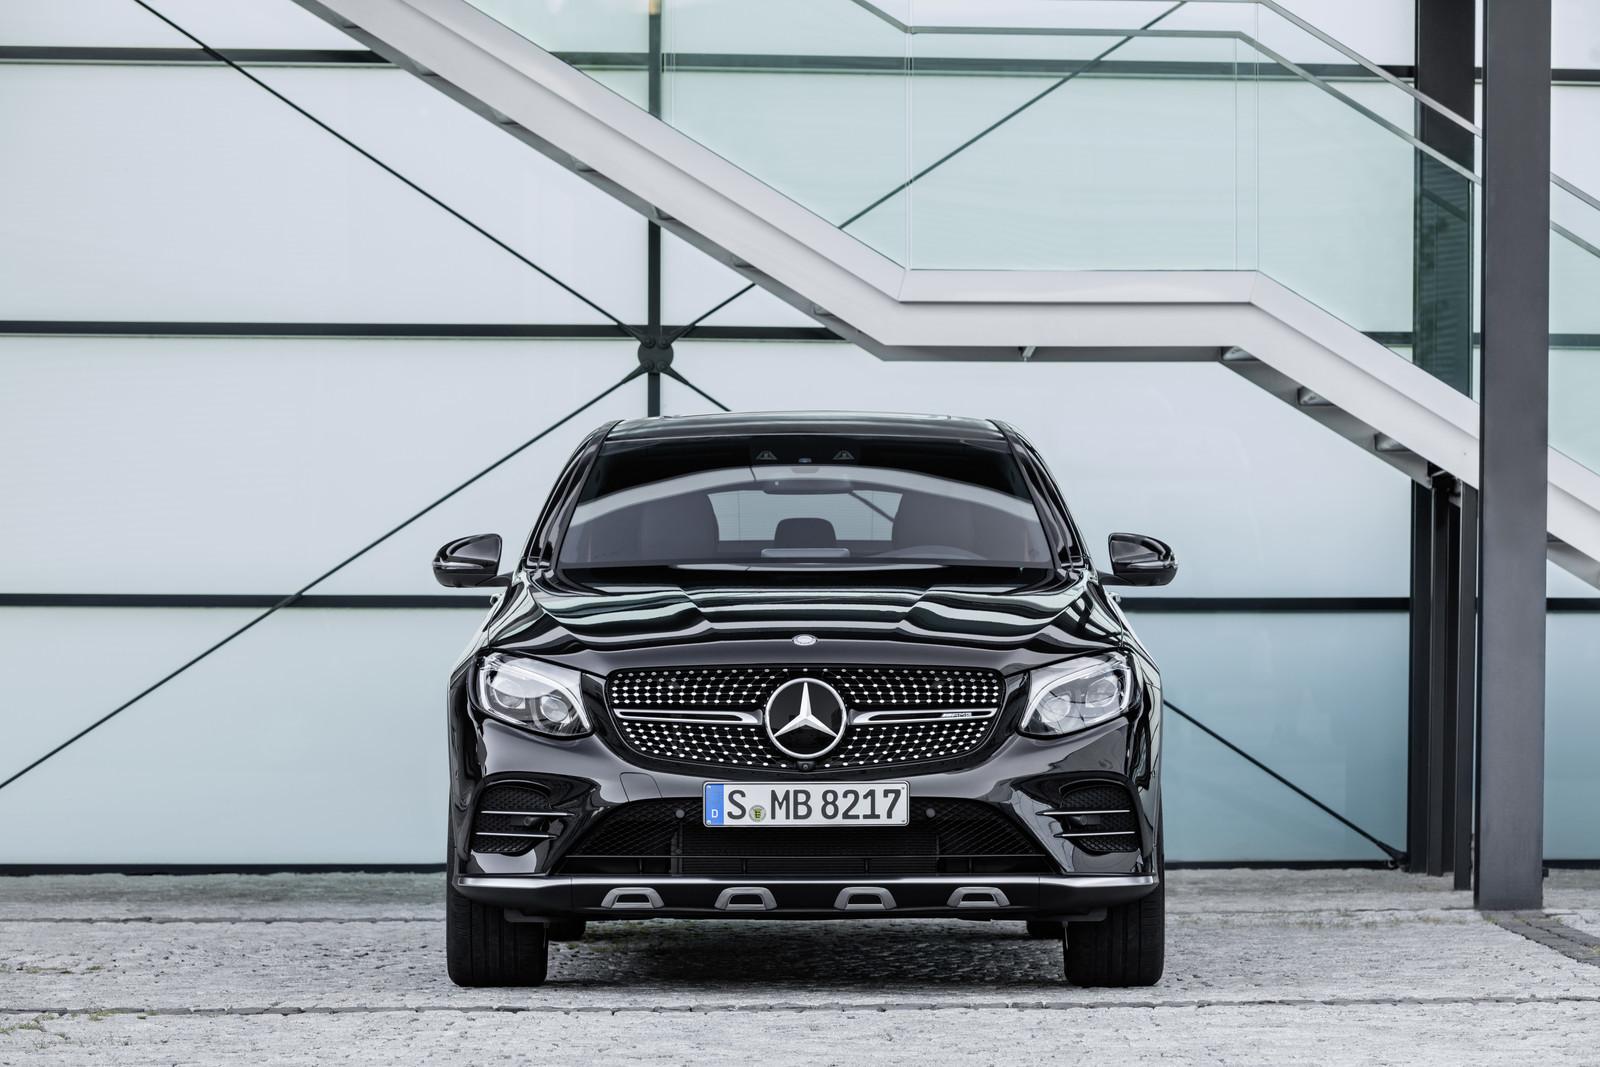 Foto de Mercedes-AMG GLC 43 4MATIC Coupé (12/24)